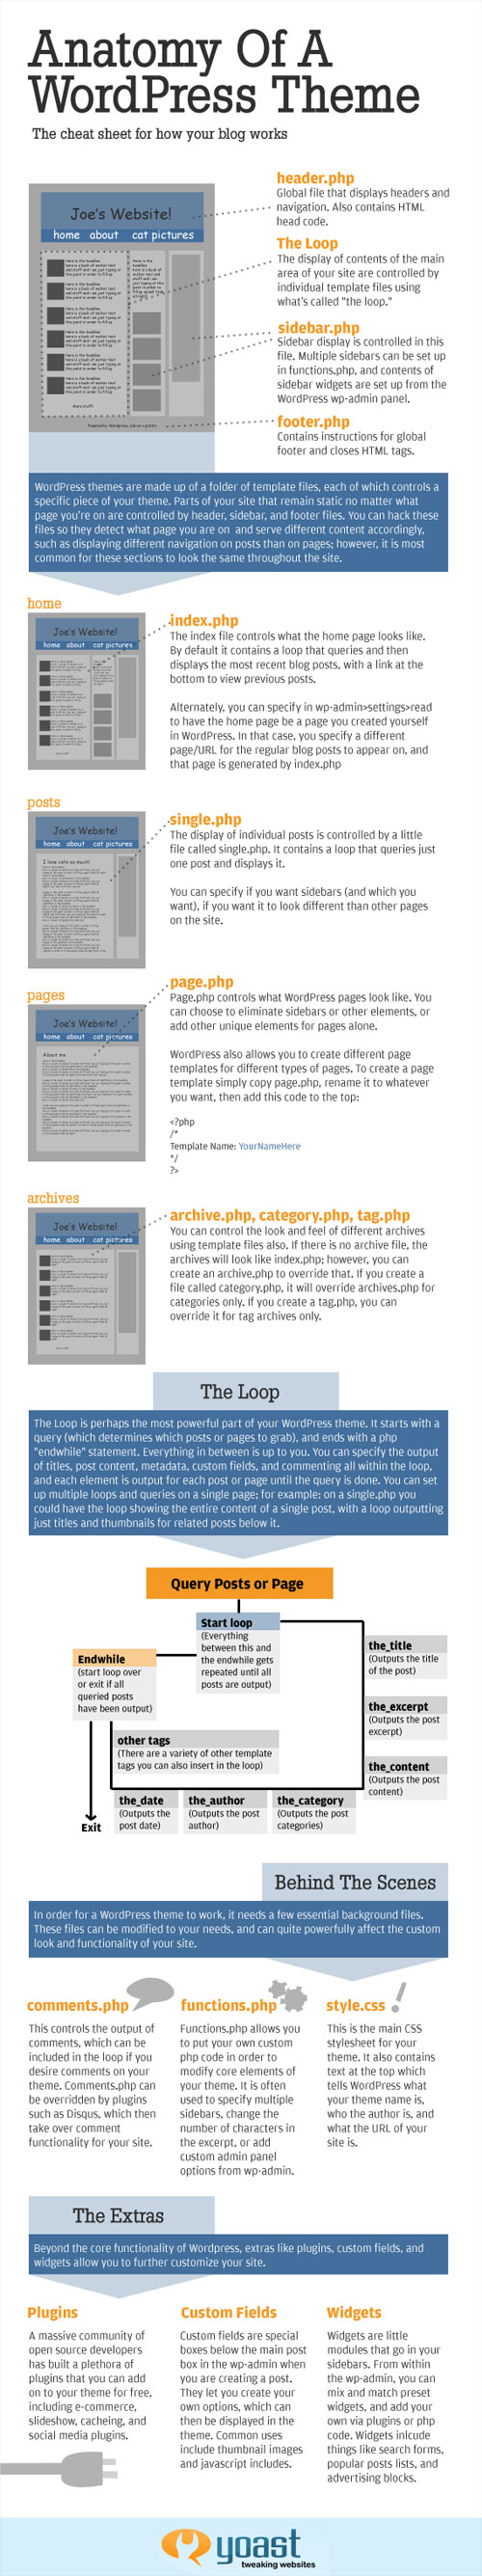 WordPress : Anatomie d'un thème